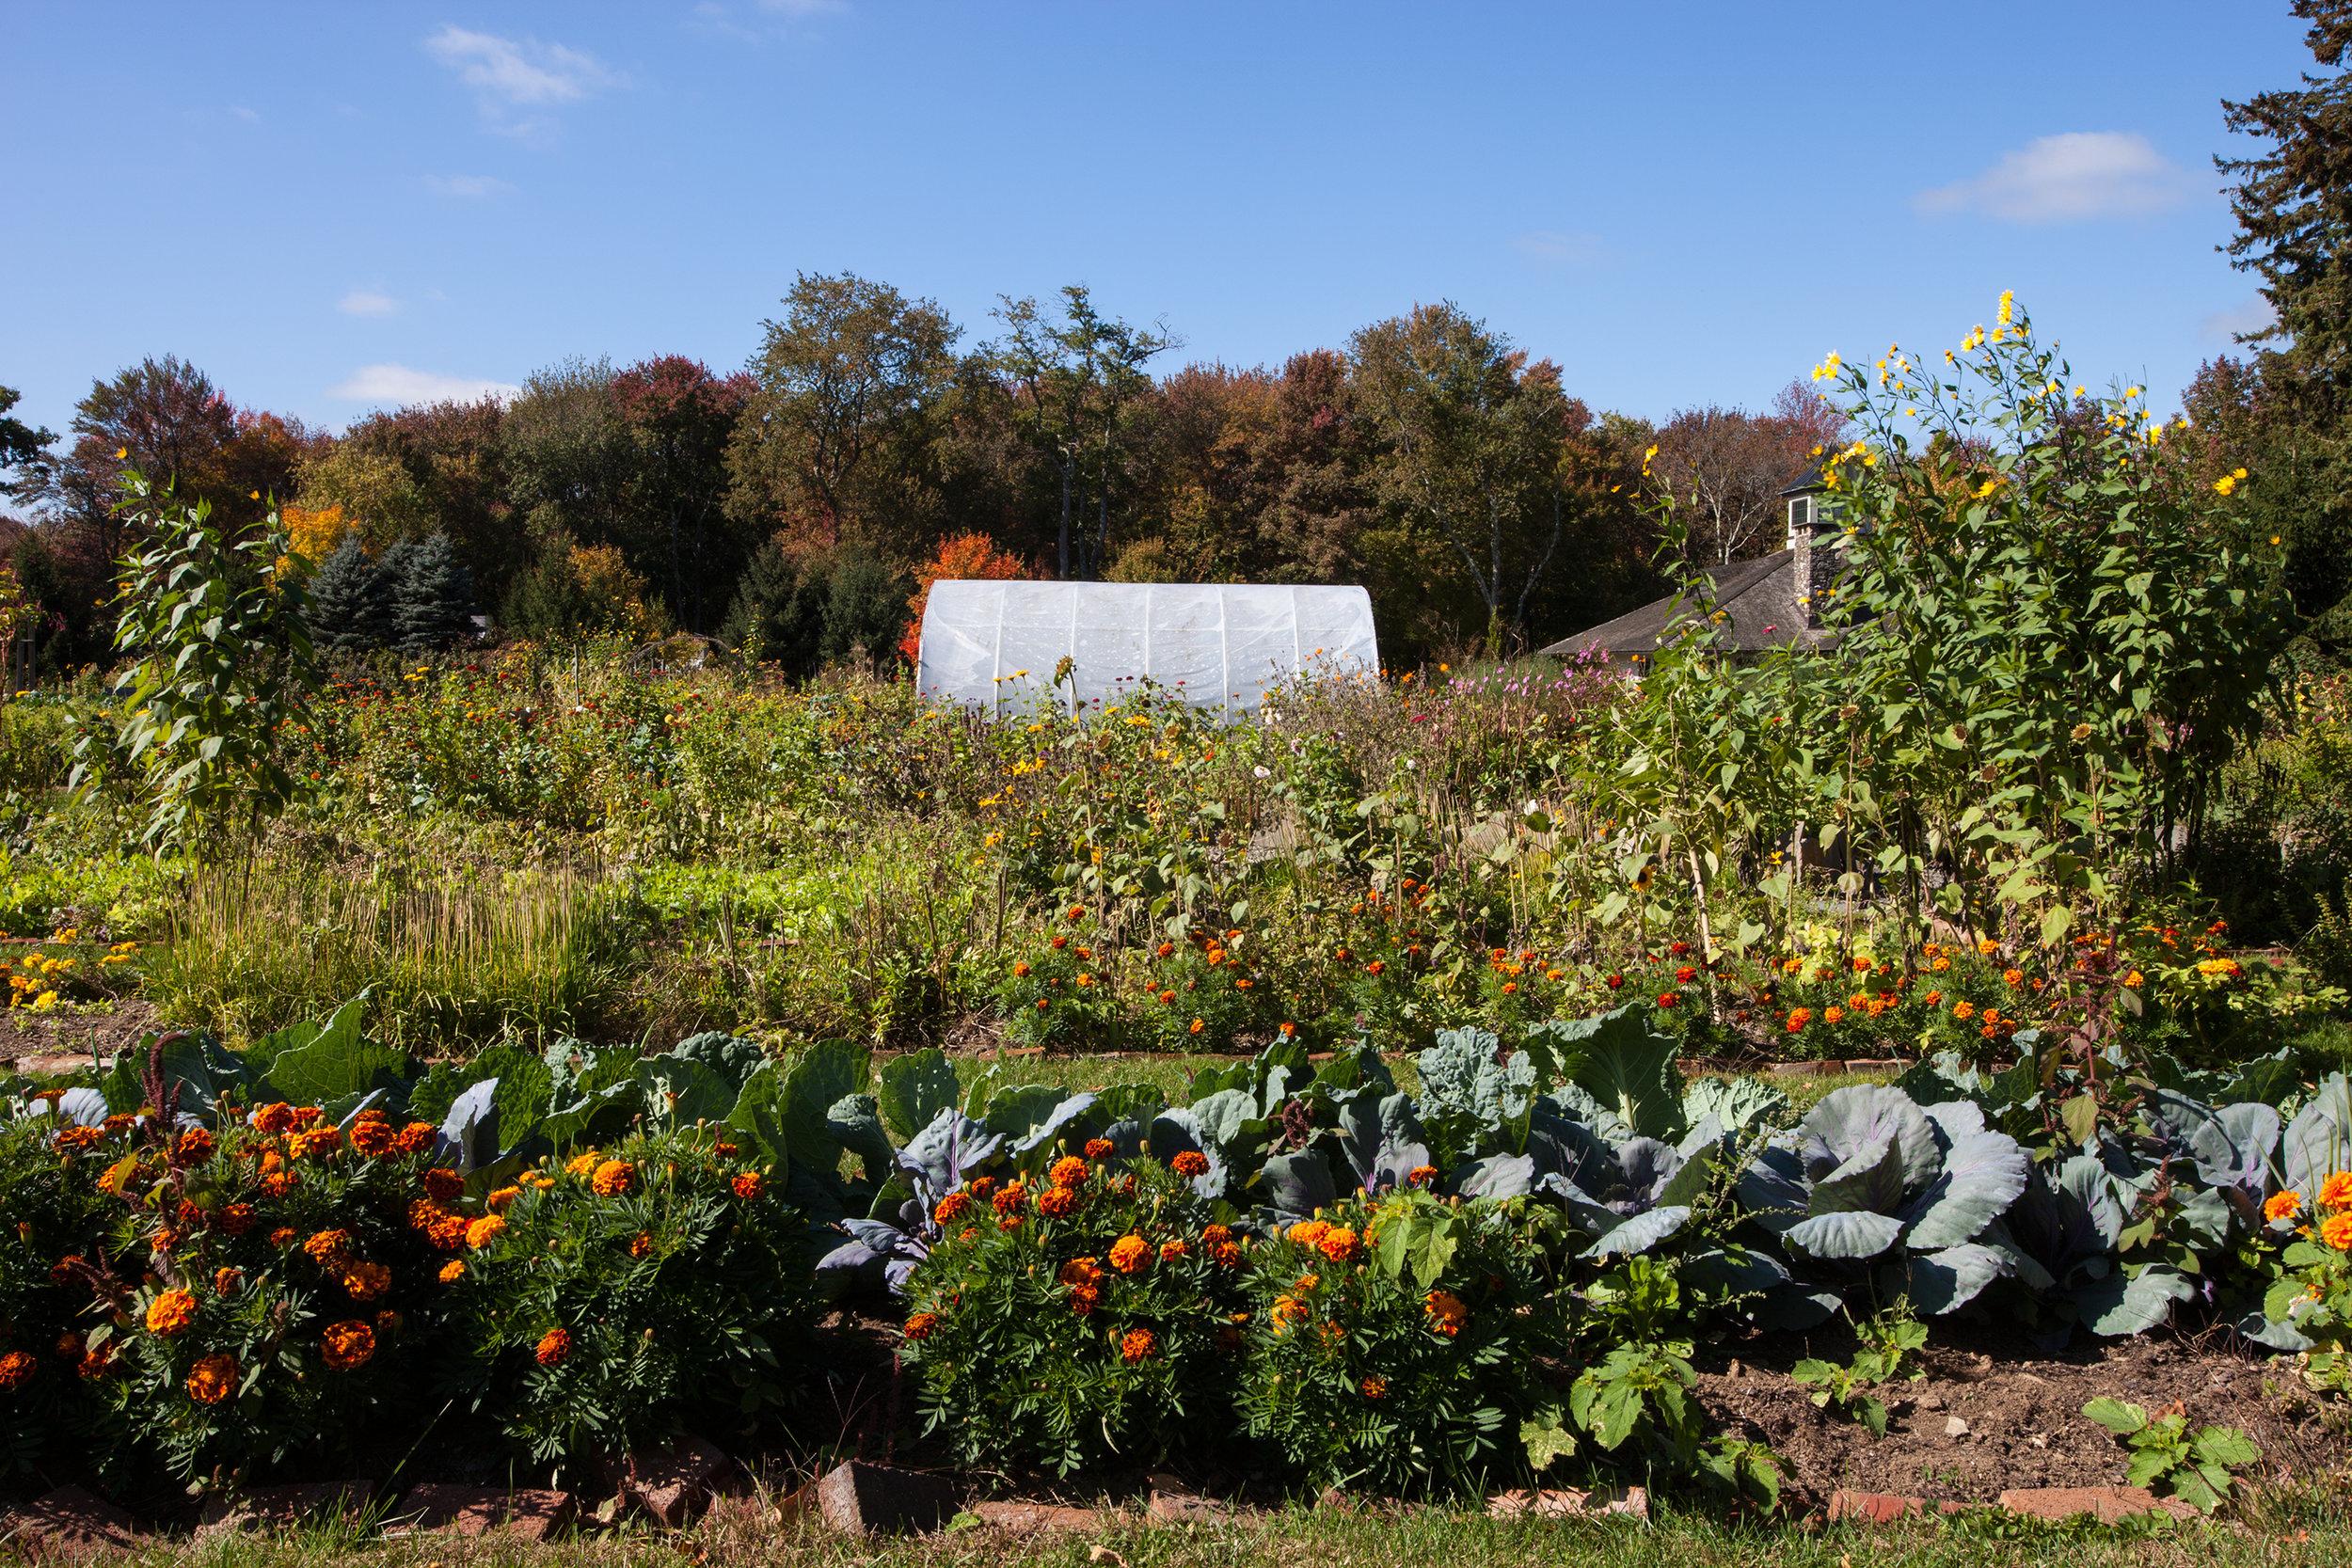 WINVIAN-FARM-CT-GARDEN-LANDSCAPE-©-JONATHAN-R.-BECKERMAN-PHOTOGRAPHY-100715_-457.jpg